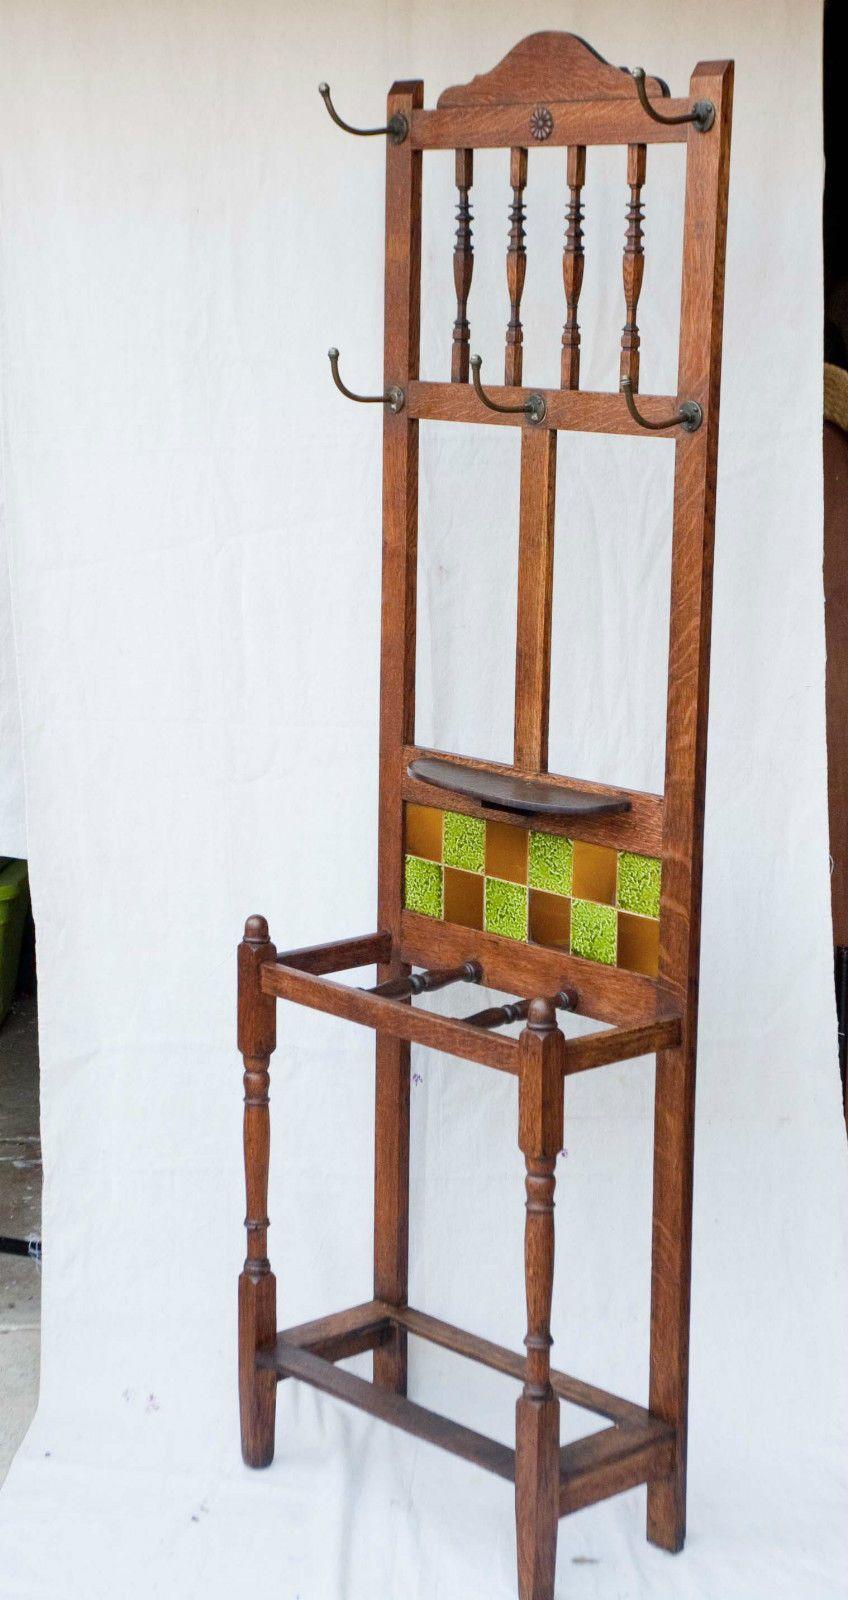 Antique English Warm Oak Wood Hall Tree Coat Rack Stand 1880 Tile Ebay Tree Coat Rack Oak Wood Hall Tree